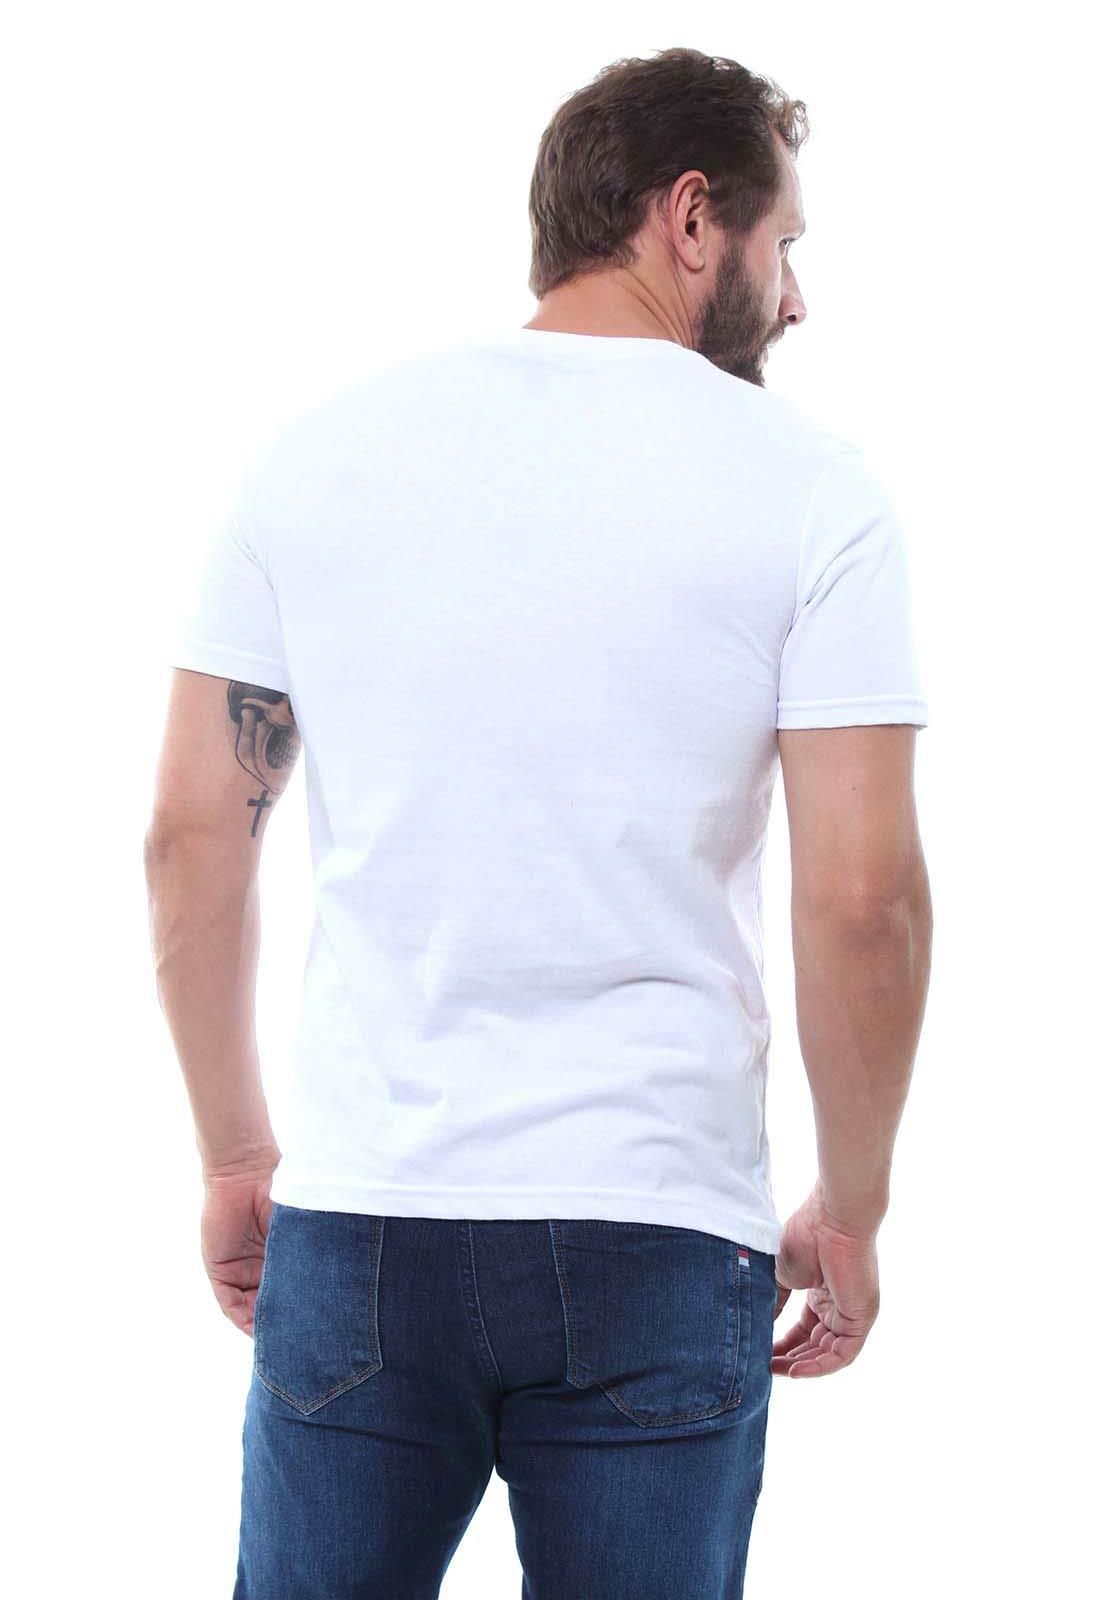 Camiseta Masculina Manga Curta Crocker - 47992  - CROCKER JEANS